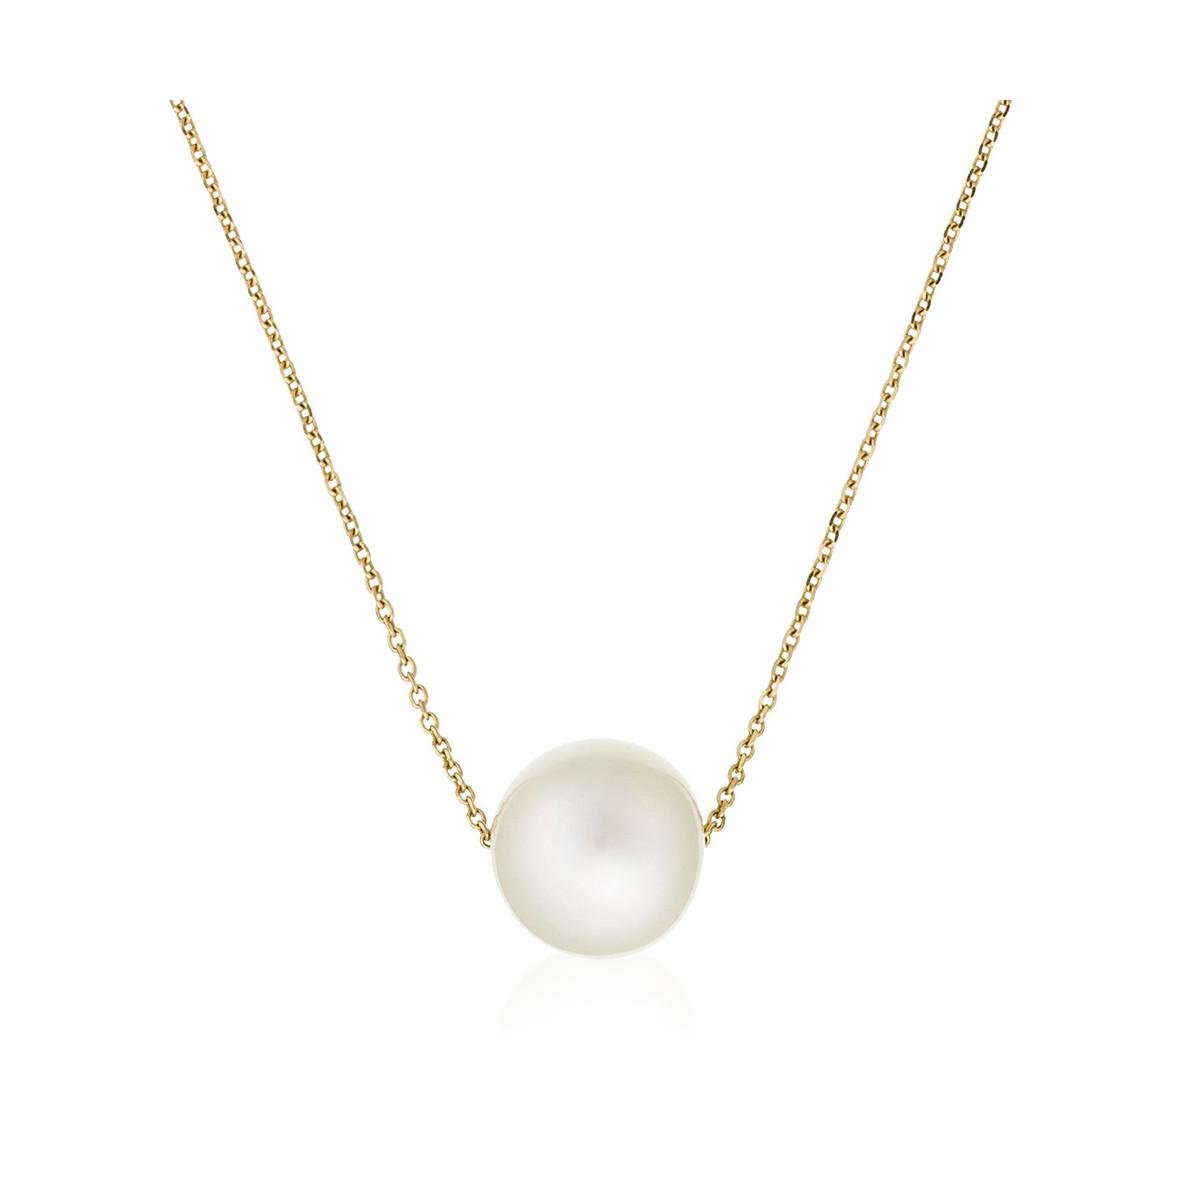 Collier Perle en Or Jaune